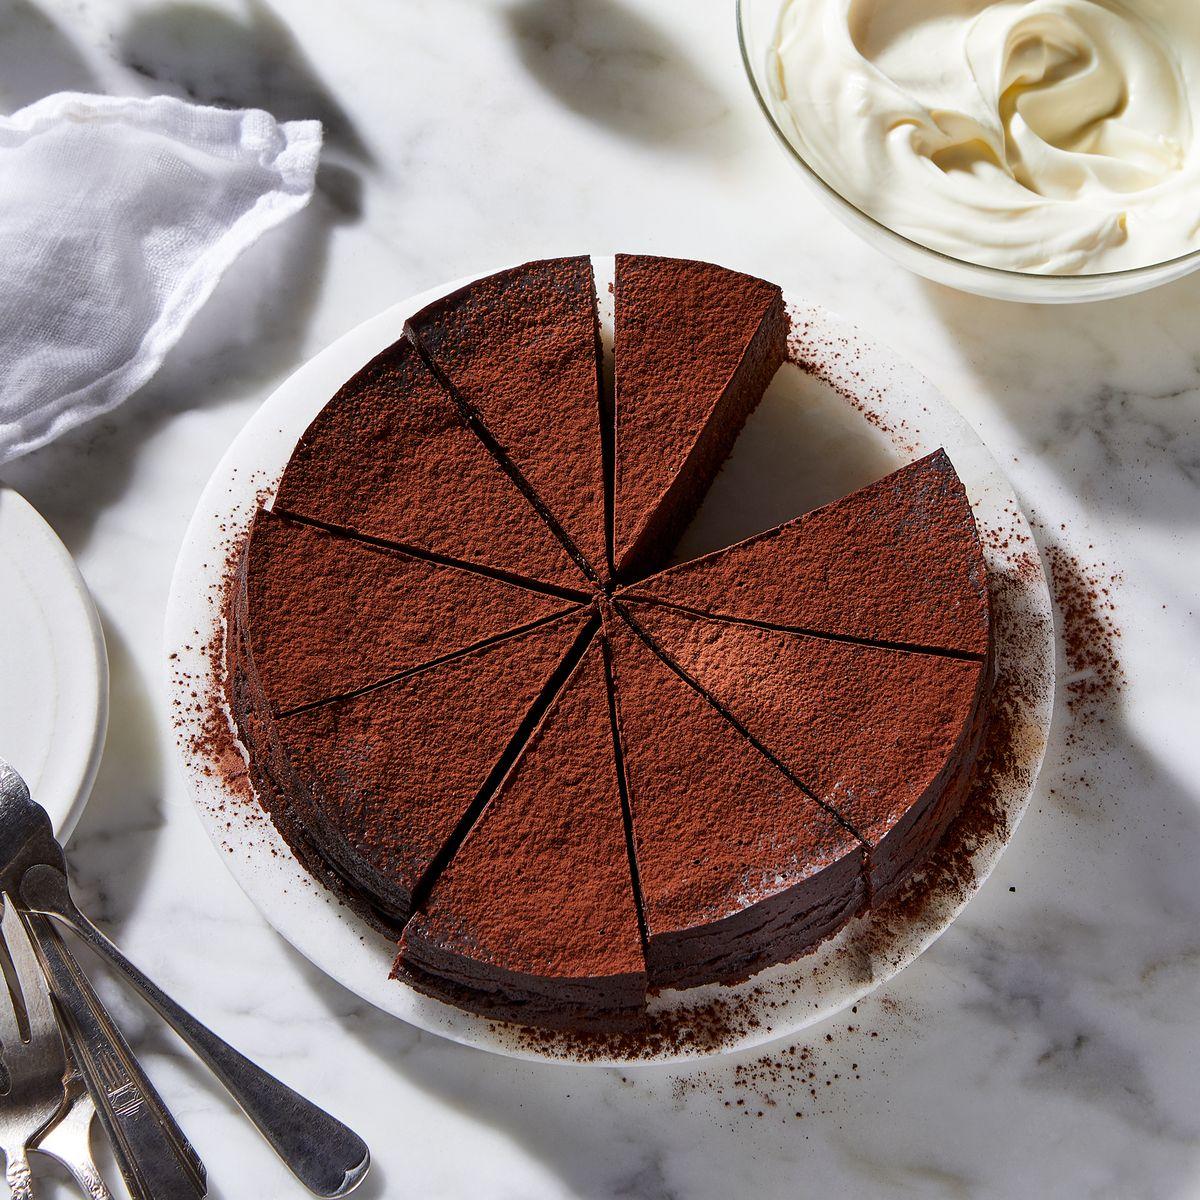 Best Instant Pot Chocolate Cake Recipe For Fudgy Flourless Dessert